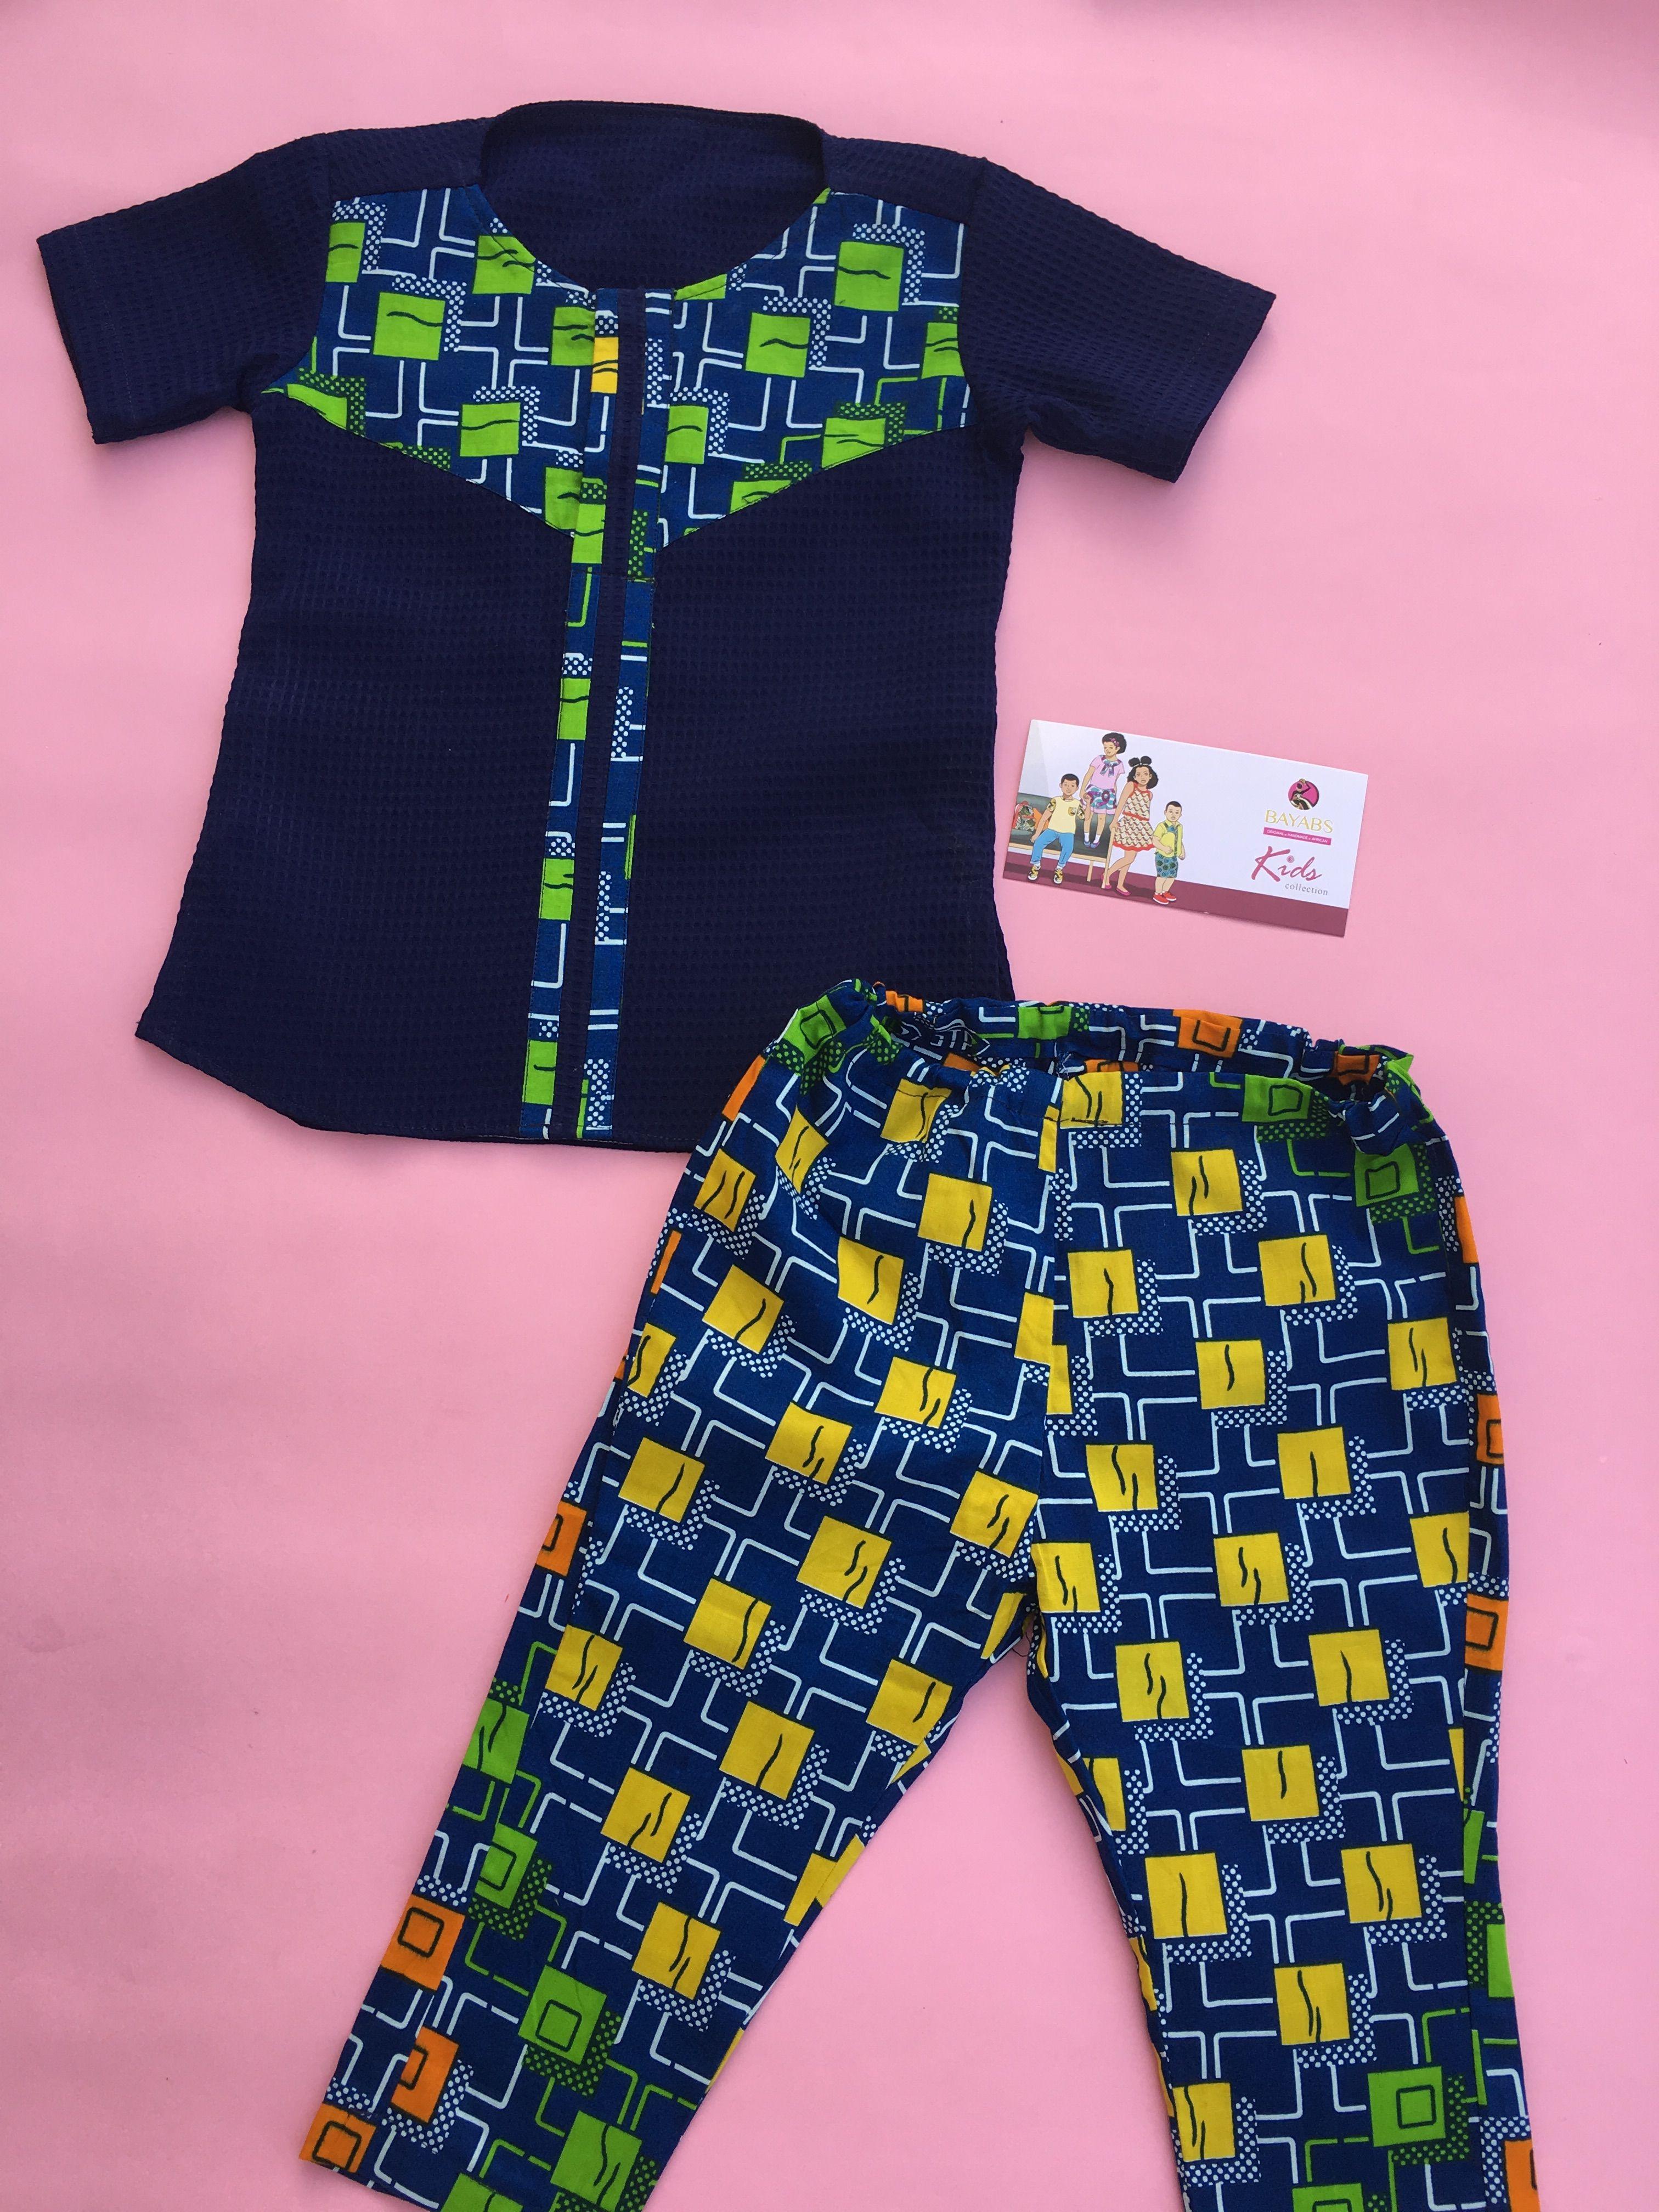 aa9349f9f Ankara kids wear. African print shirt and african print pants for ...